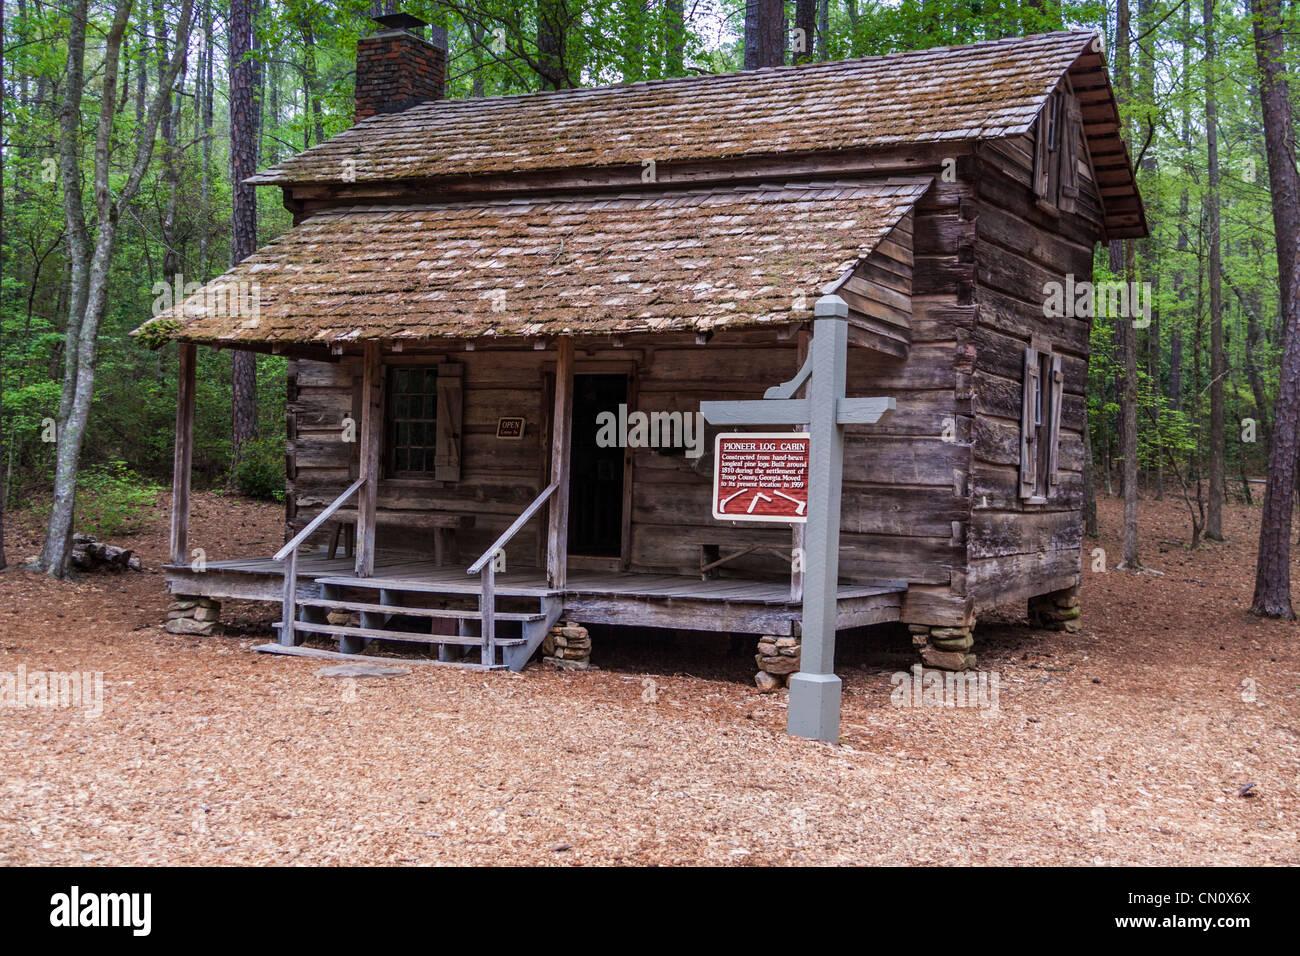 Pioneer Log Cabin At Callaway Gardens In Pine Mountain, Georgia.   Stock  Image